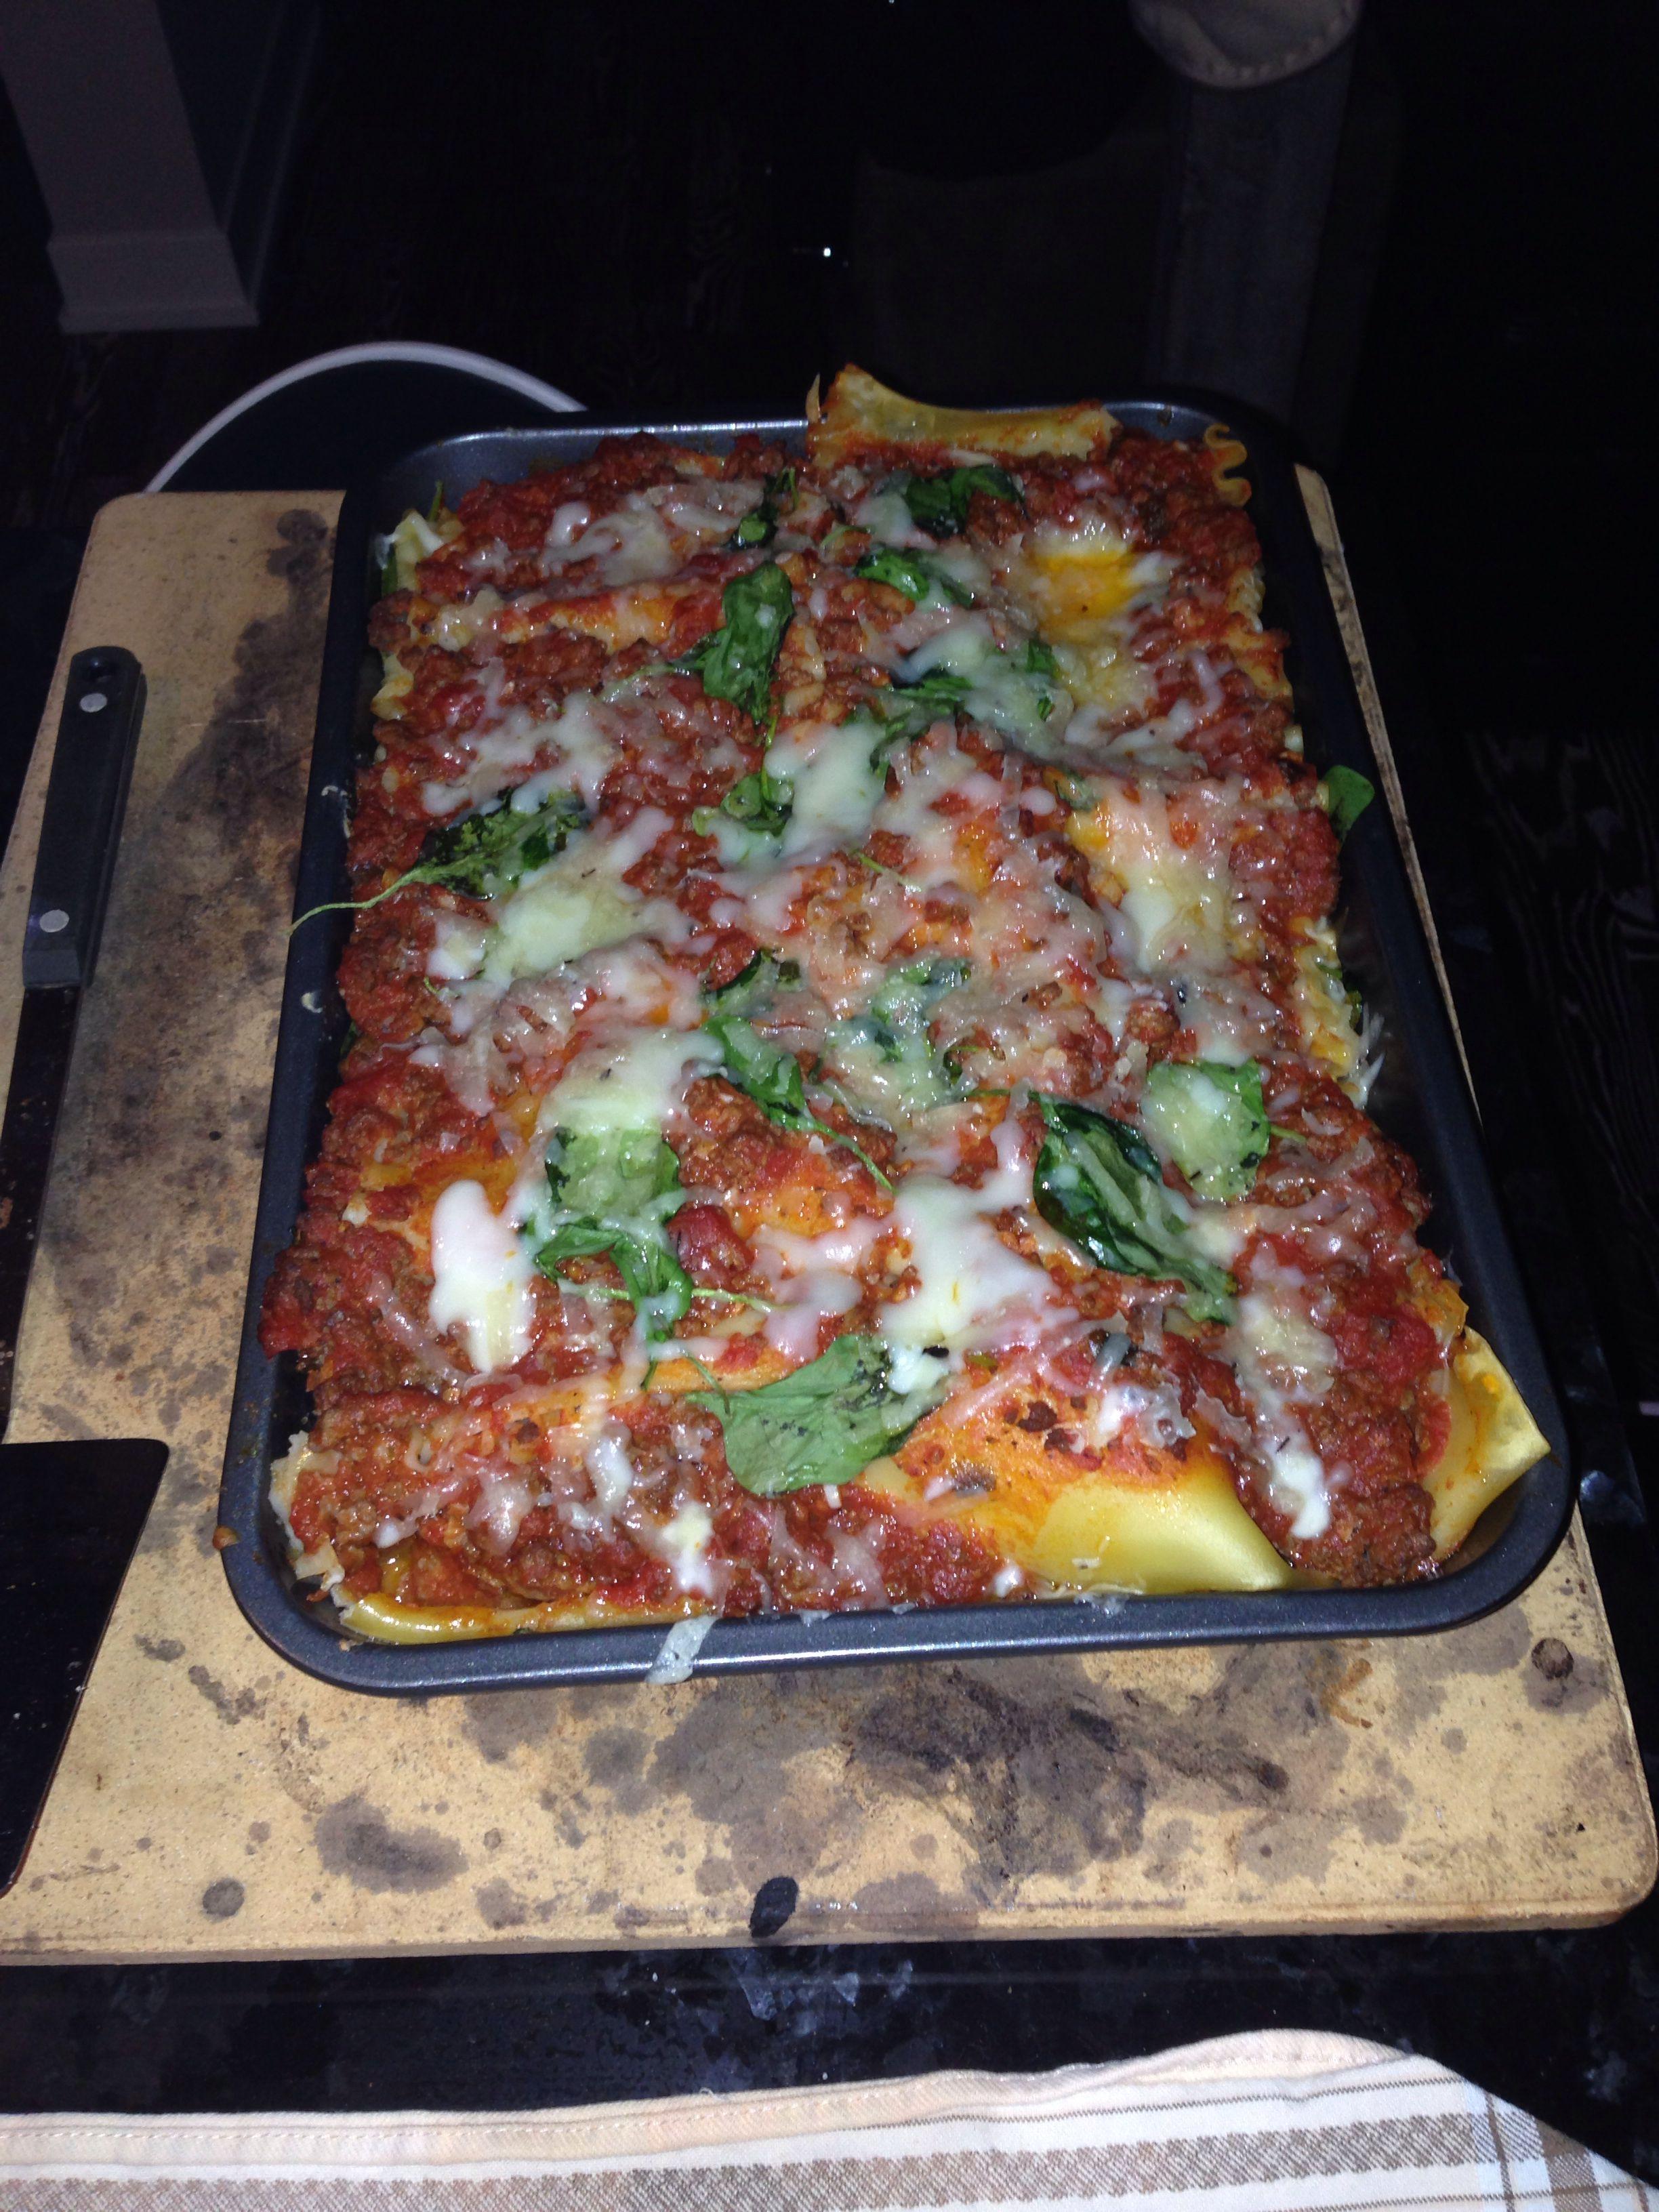 I made 7 layer lasagna tonight #dinner yum!